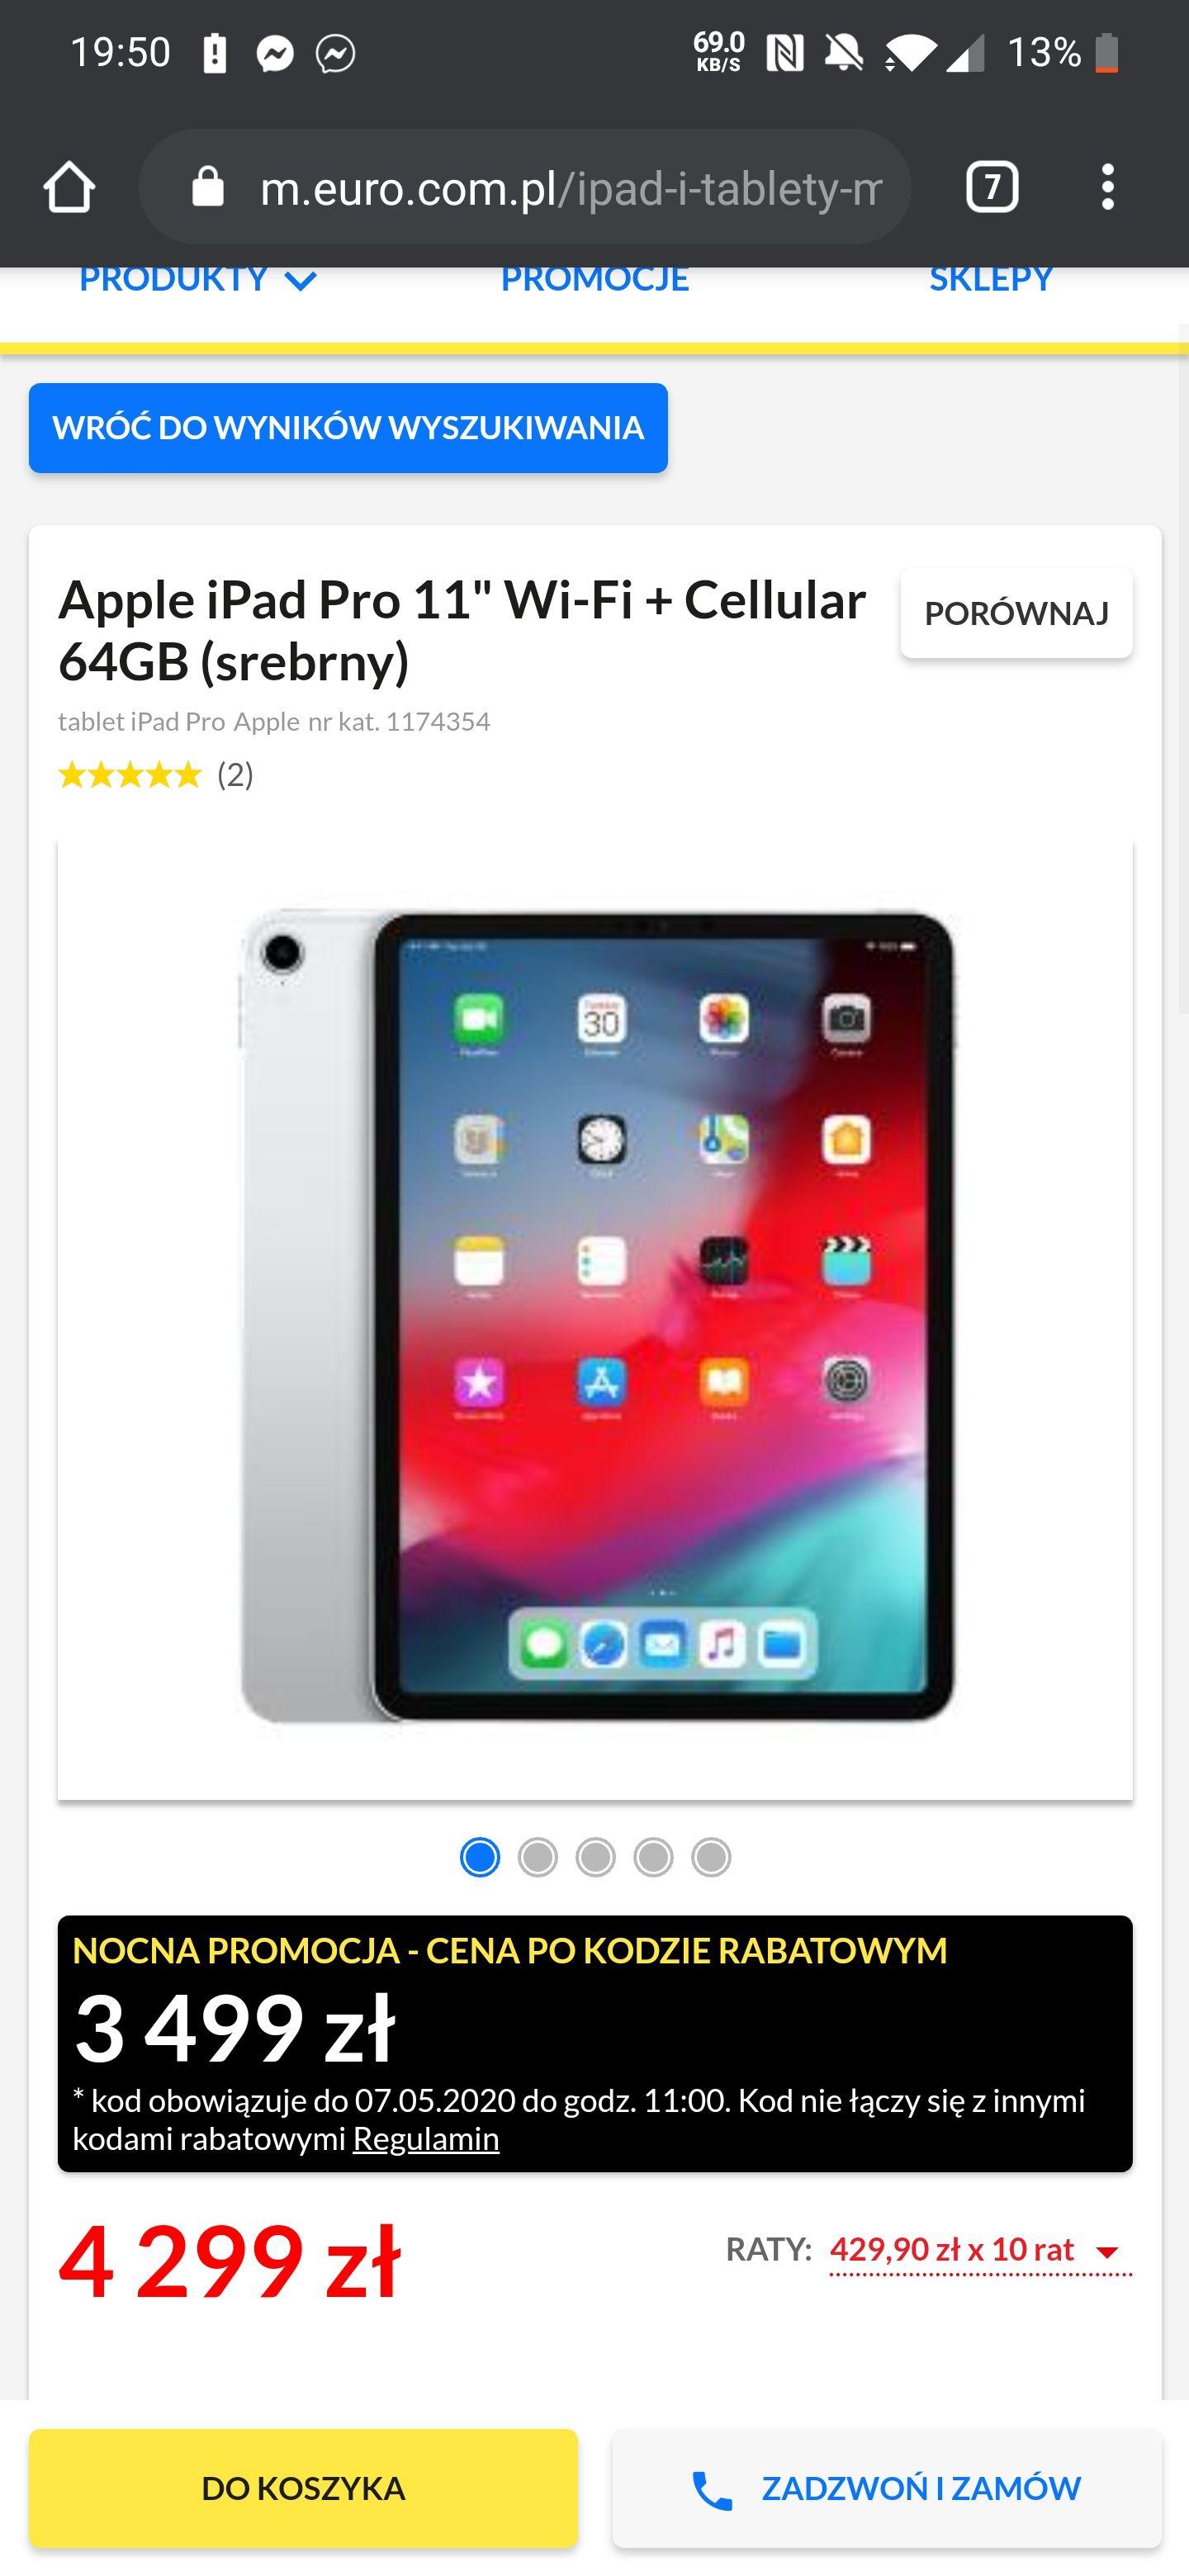 "Apple iPad Pro 11"" Wi-Fi + Cellular 64GB (srebrny) Nocna promocja w RTV"